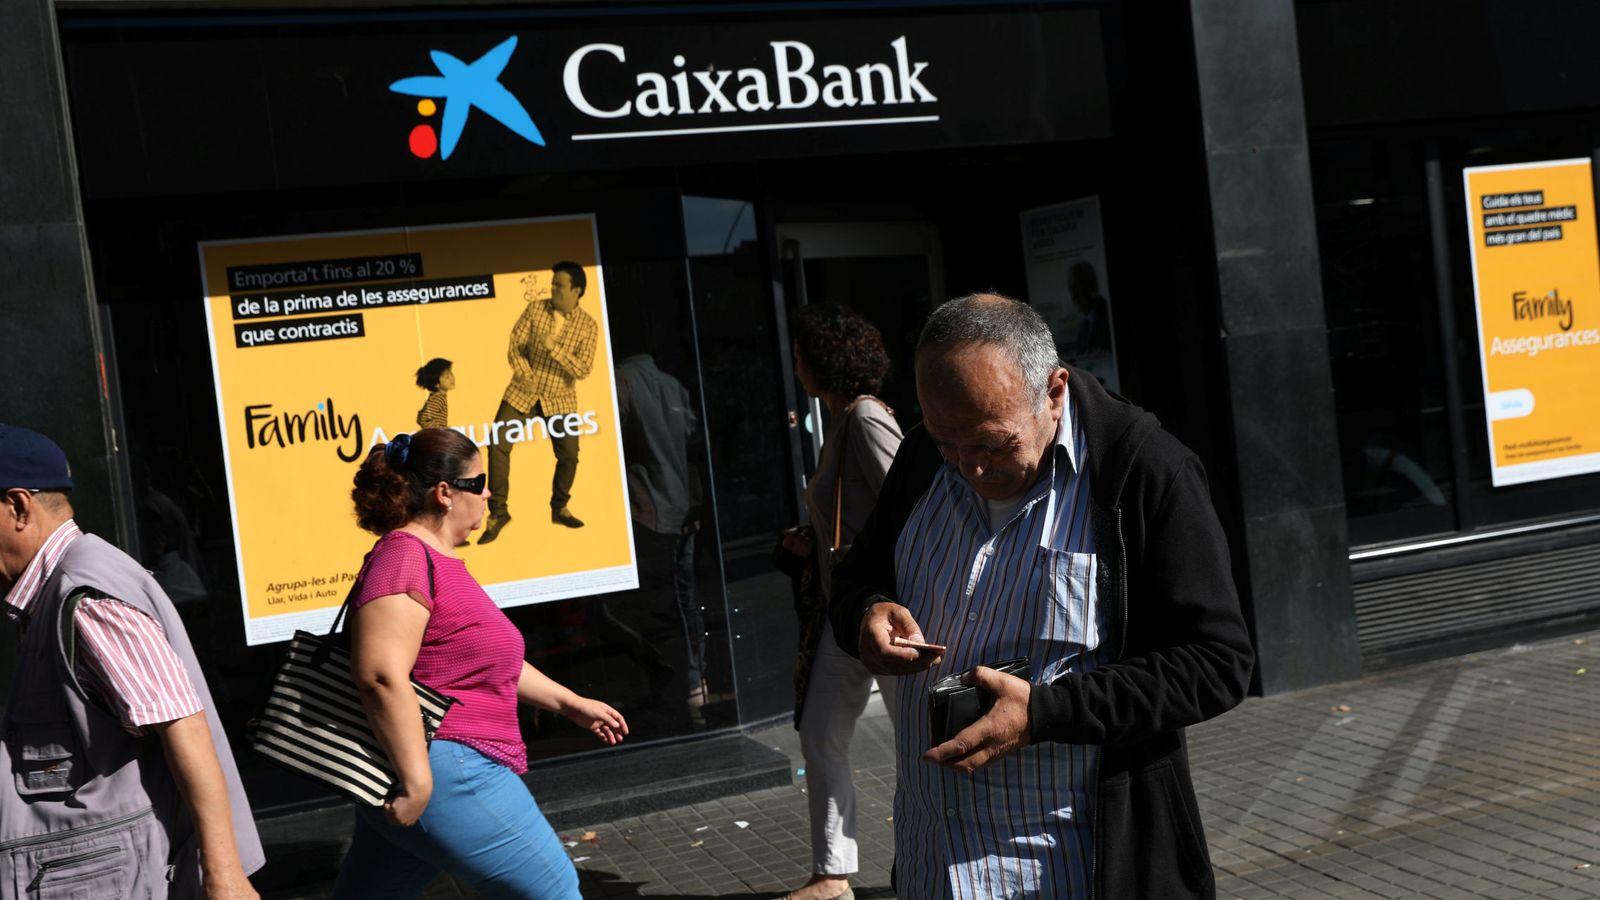 Foto:  Un cajero de CaixaBank en Barcelona. (REUTERS)